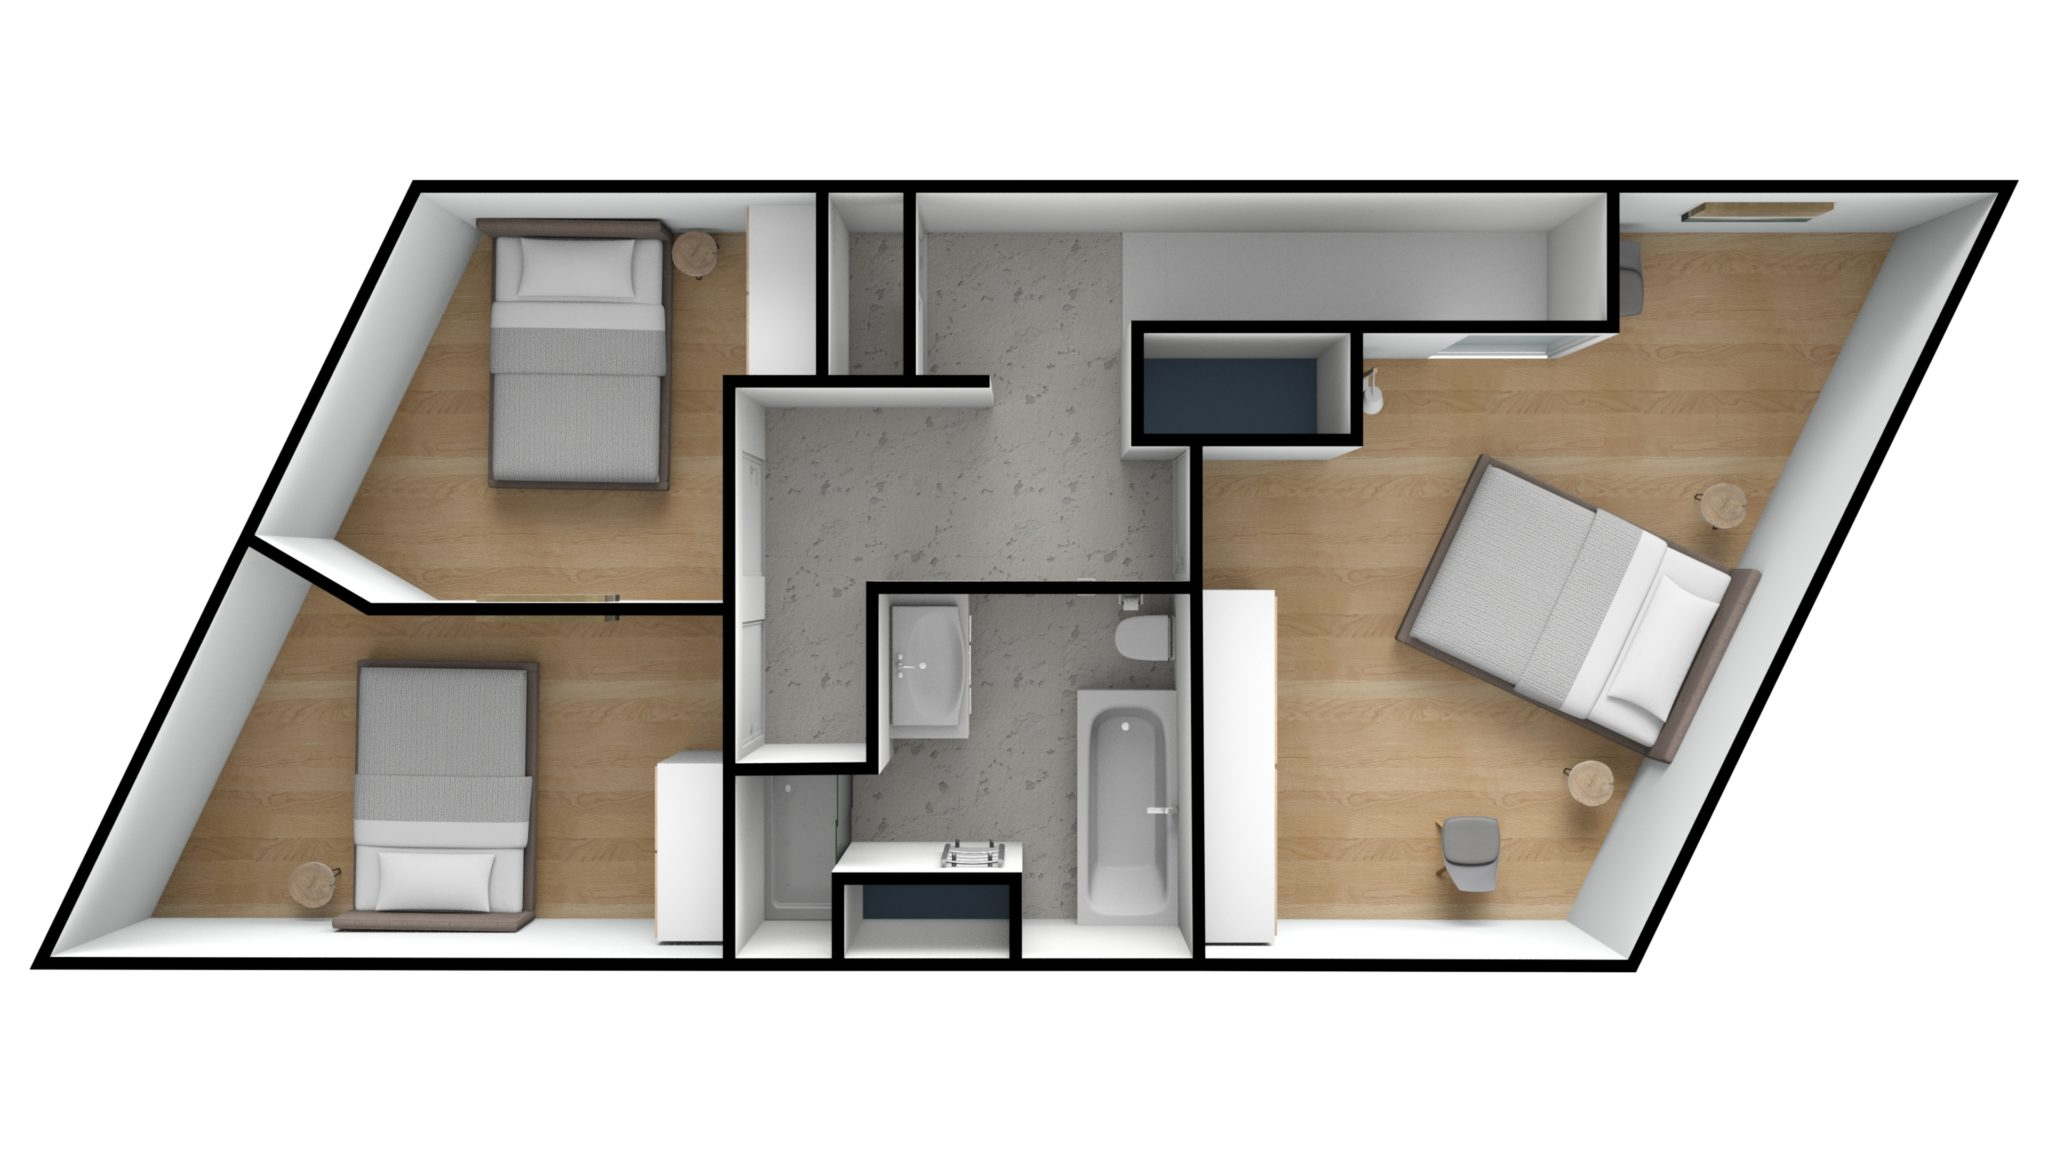 Astridlaan duplex 2e verdiep 3D TOP